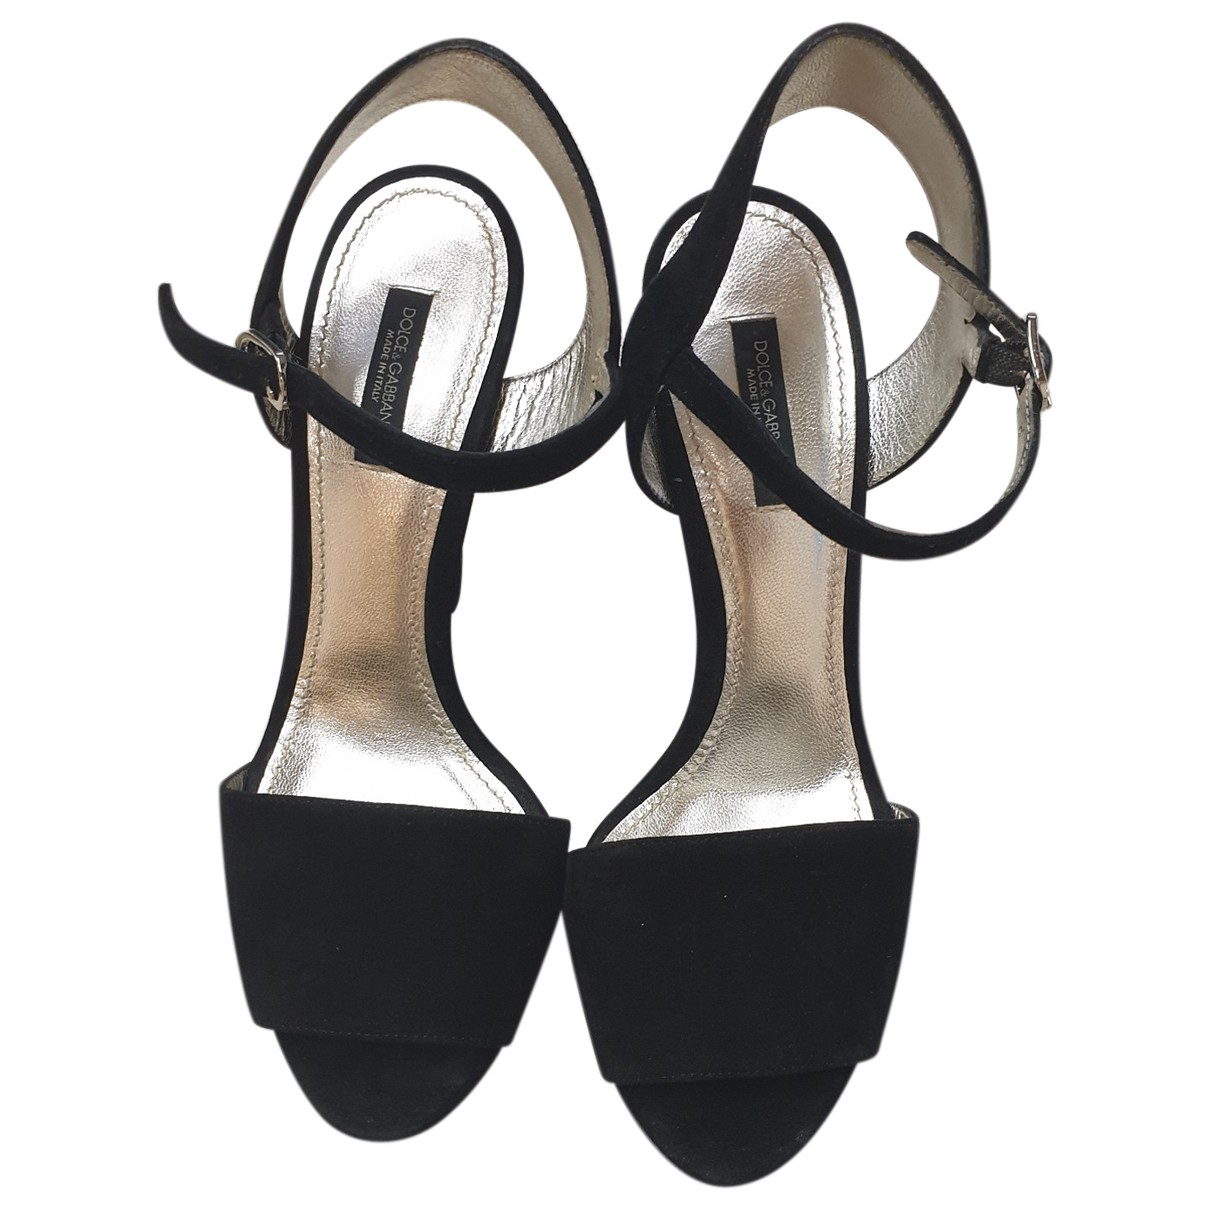 Dolce & Gabbana \N Black Suede Sandals for Women 38 EU